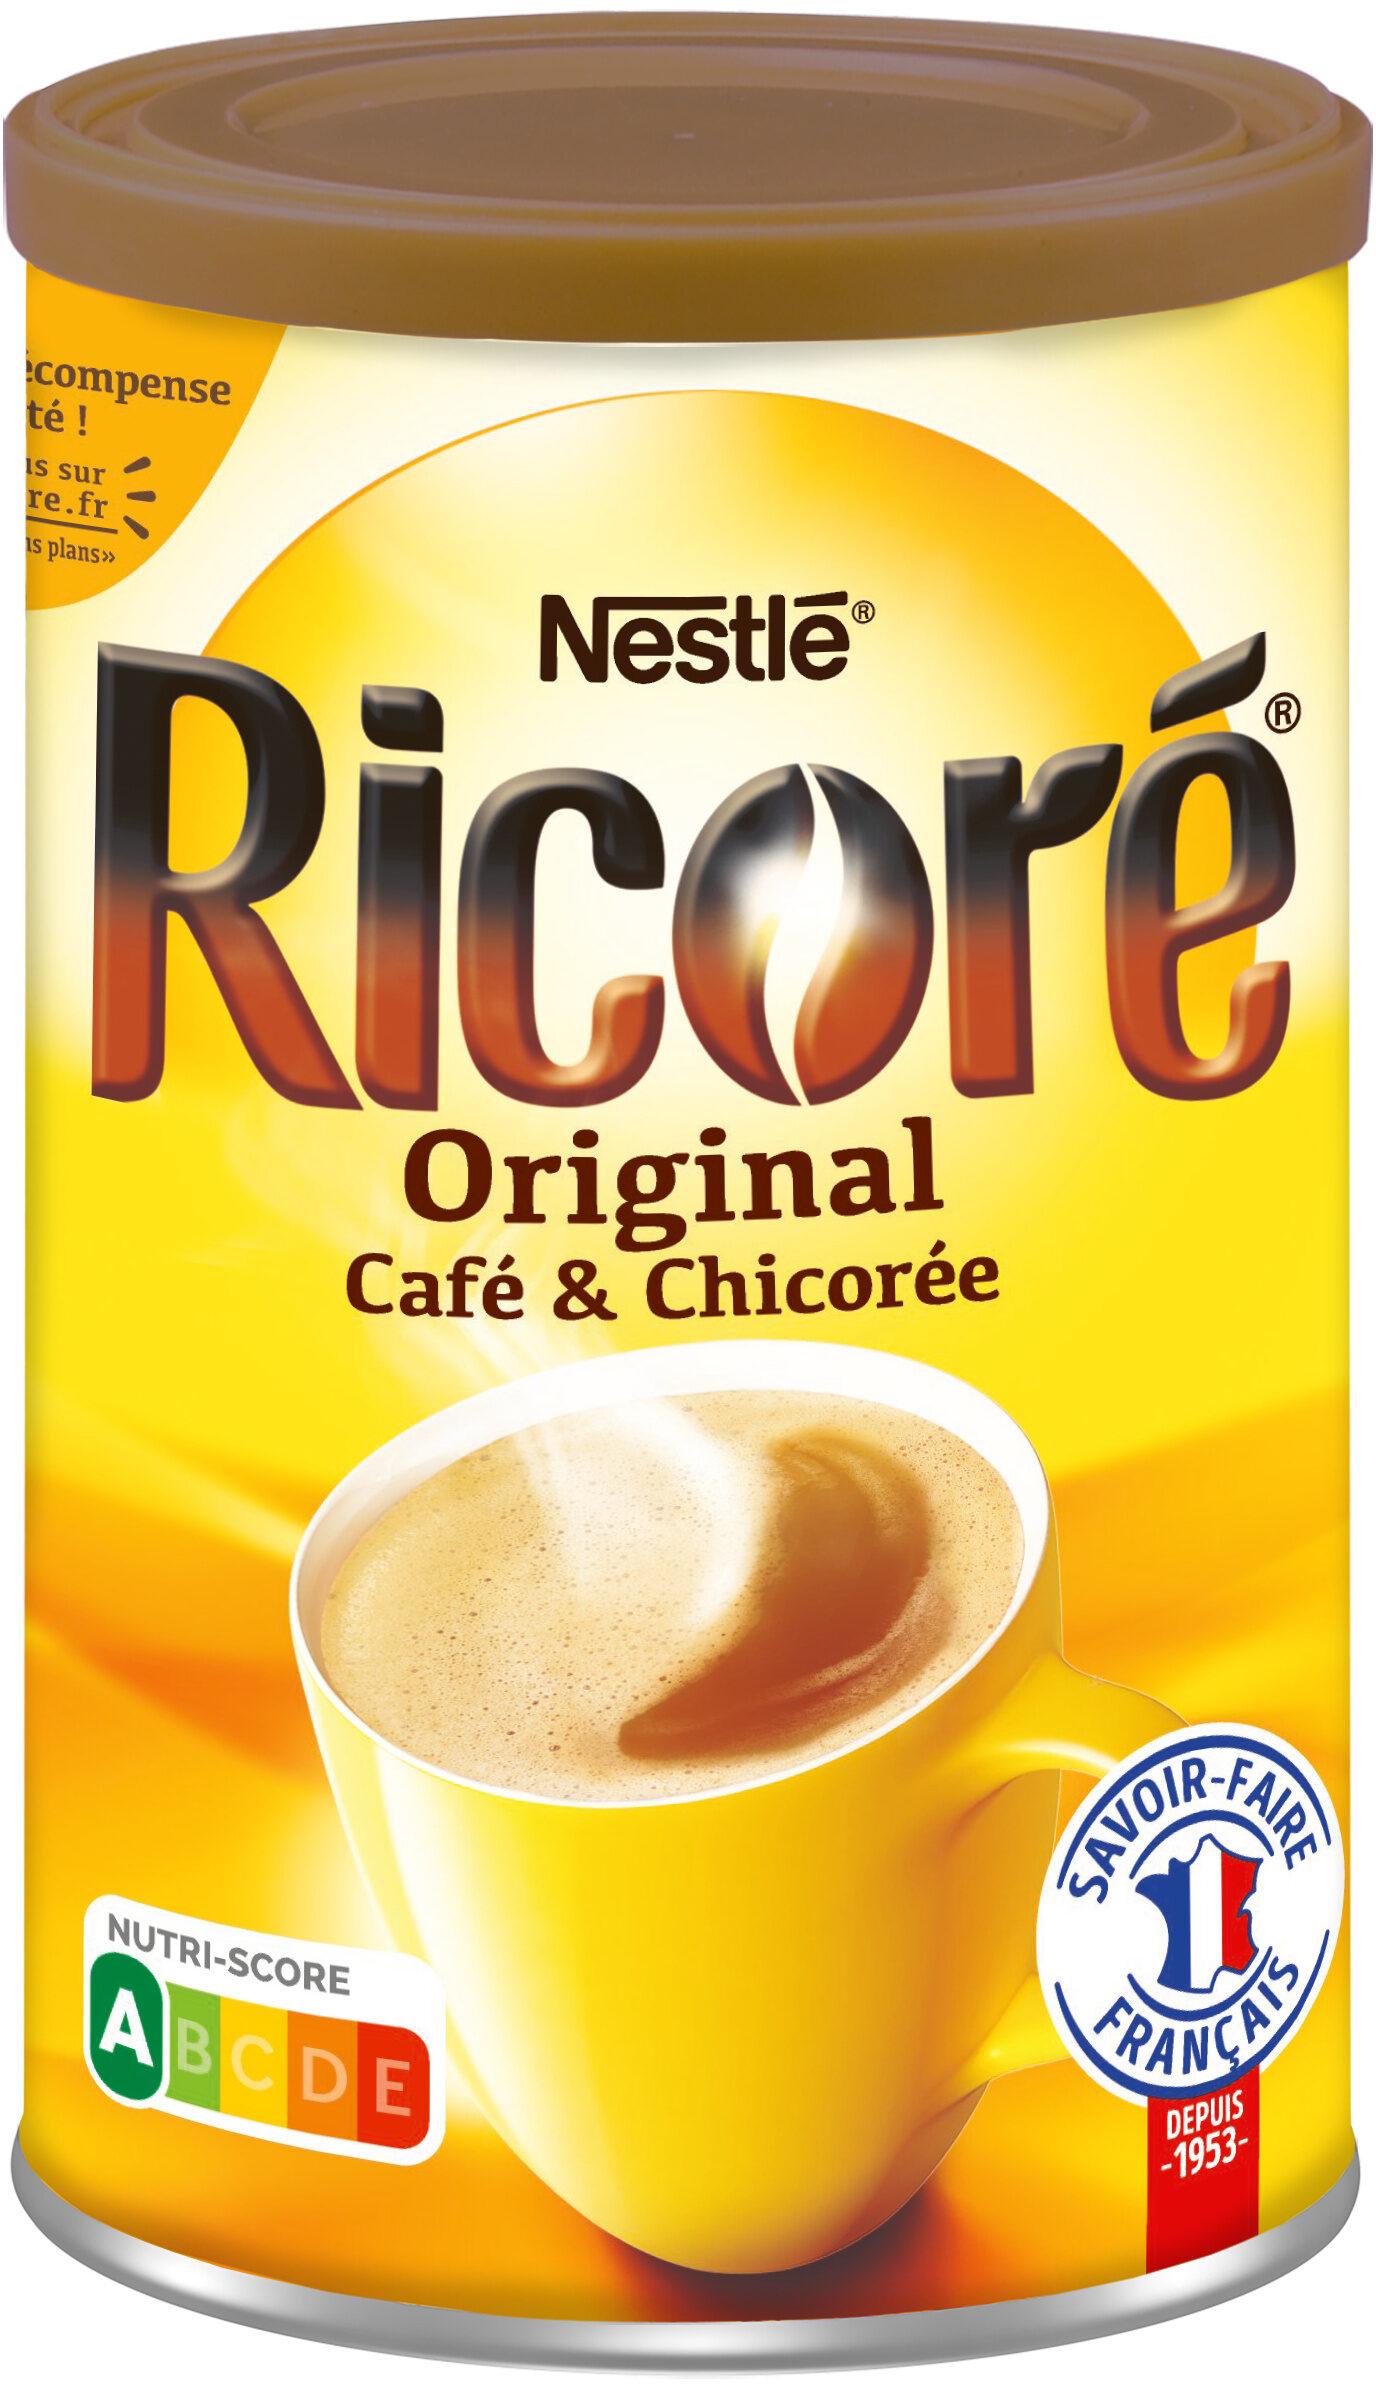 RICORE Original boite 260g - Produit - fr